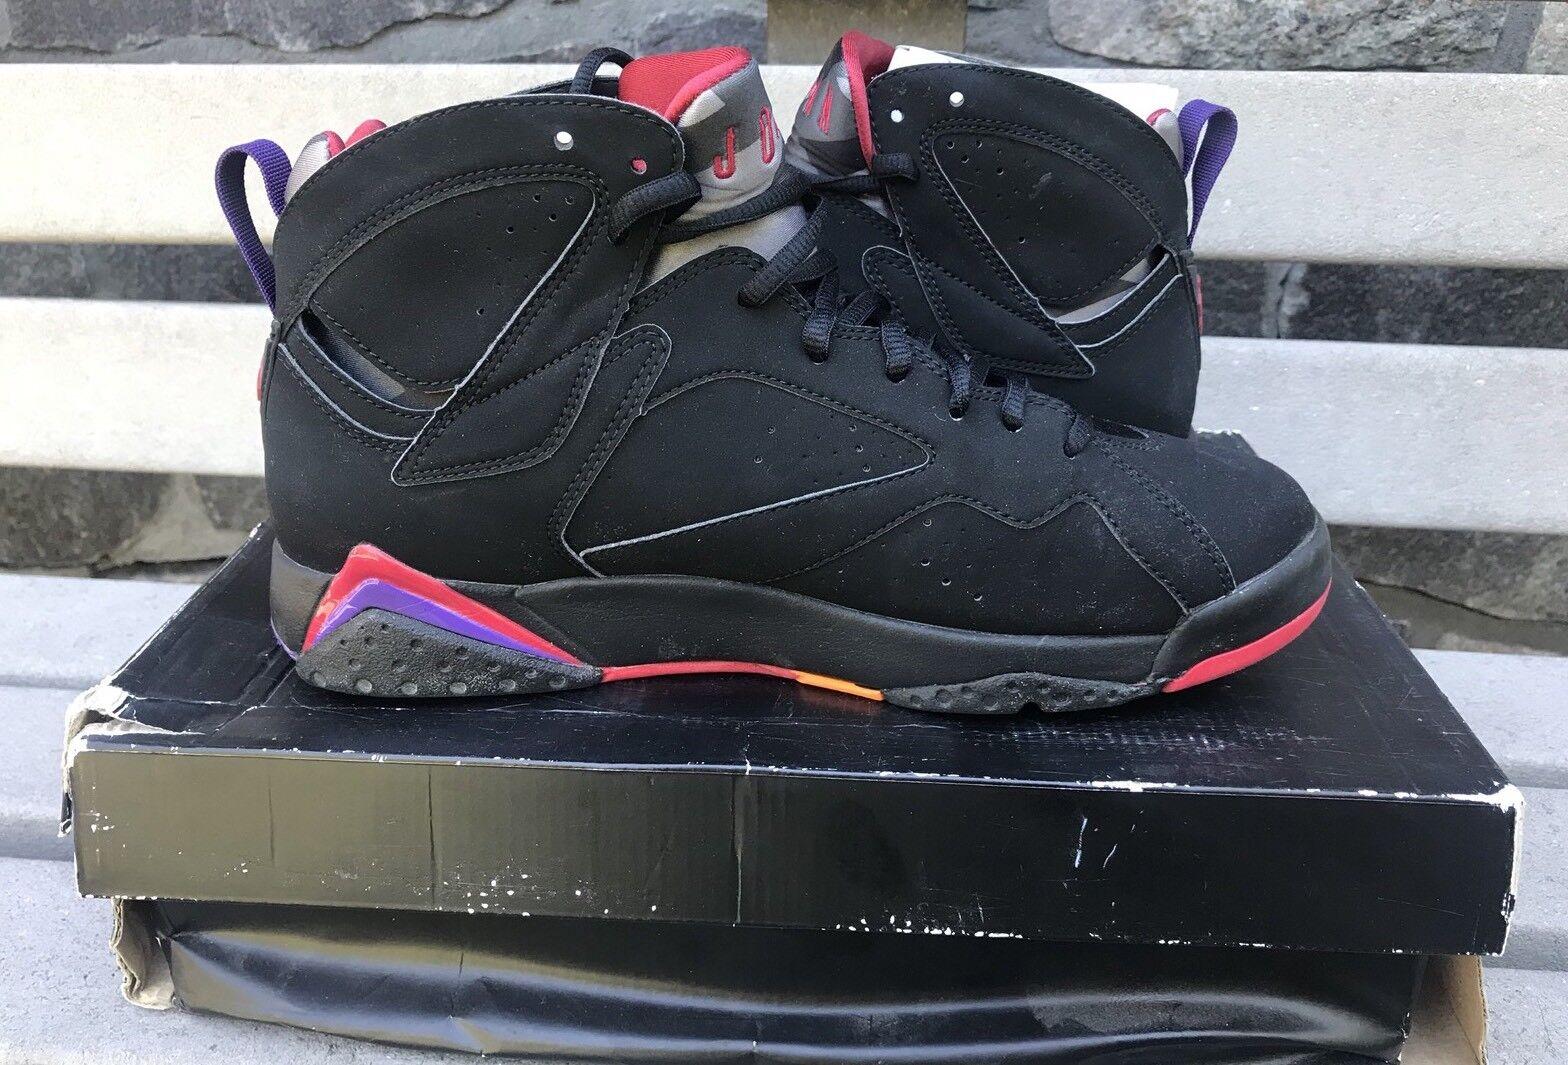 Nike Air Jordan VII 7 Retro  RAPTORS   BLACK PURPLE RED 304775-018 Size 10